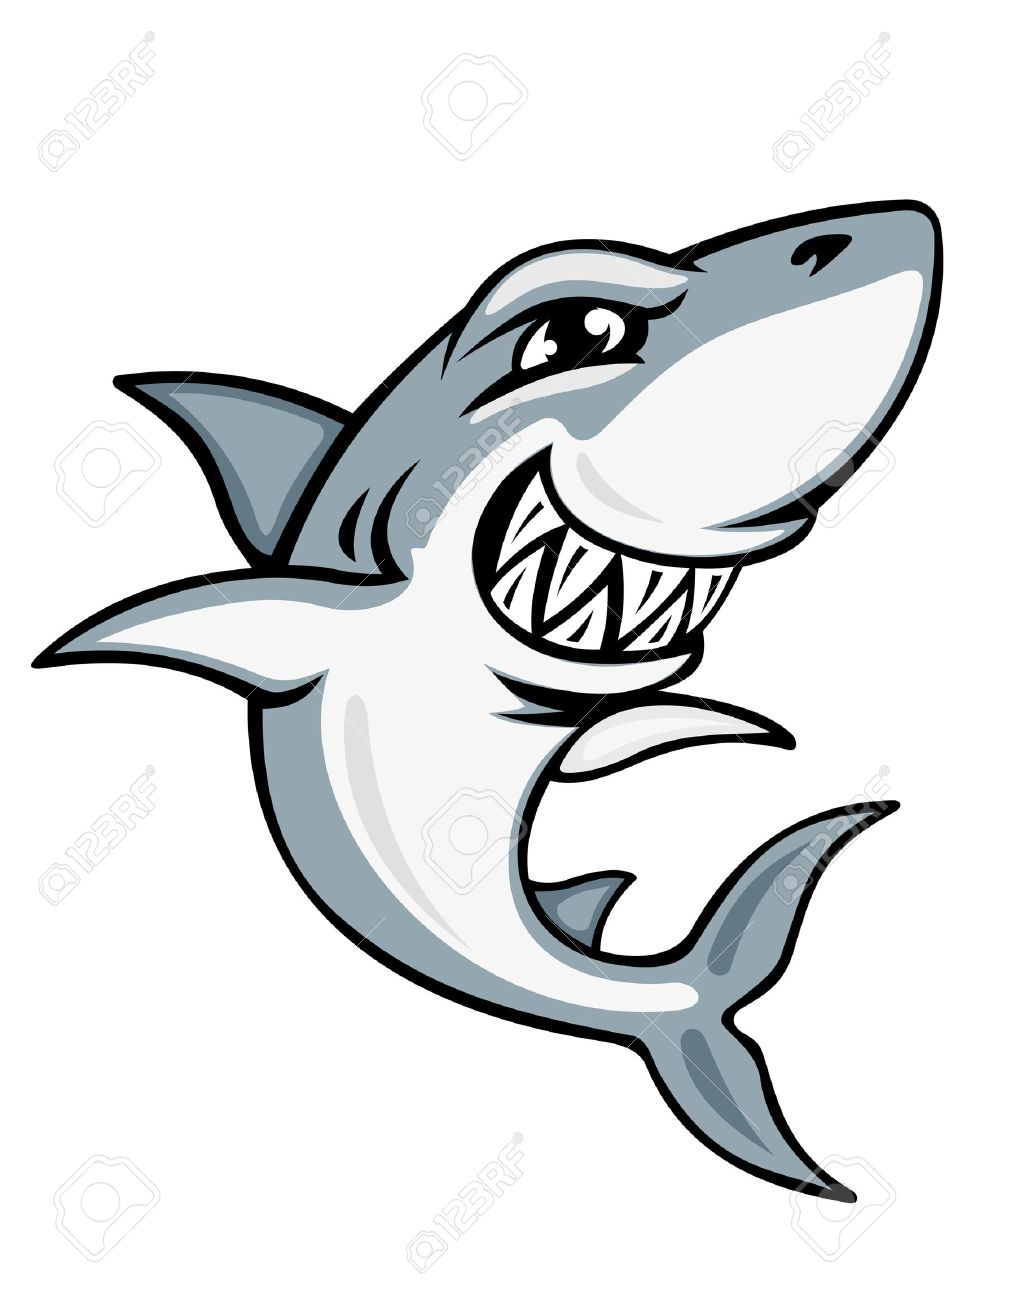 Cartoon Smiling Shark For Mascot And Emblem Design Stock Vector